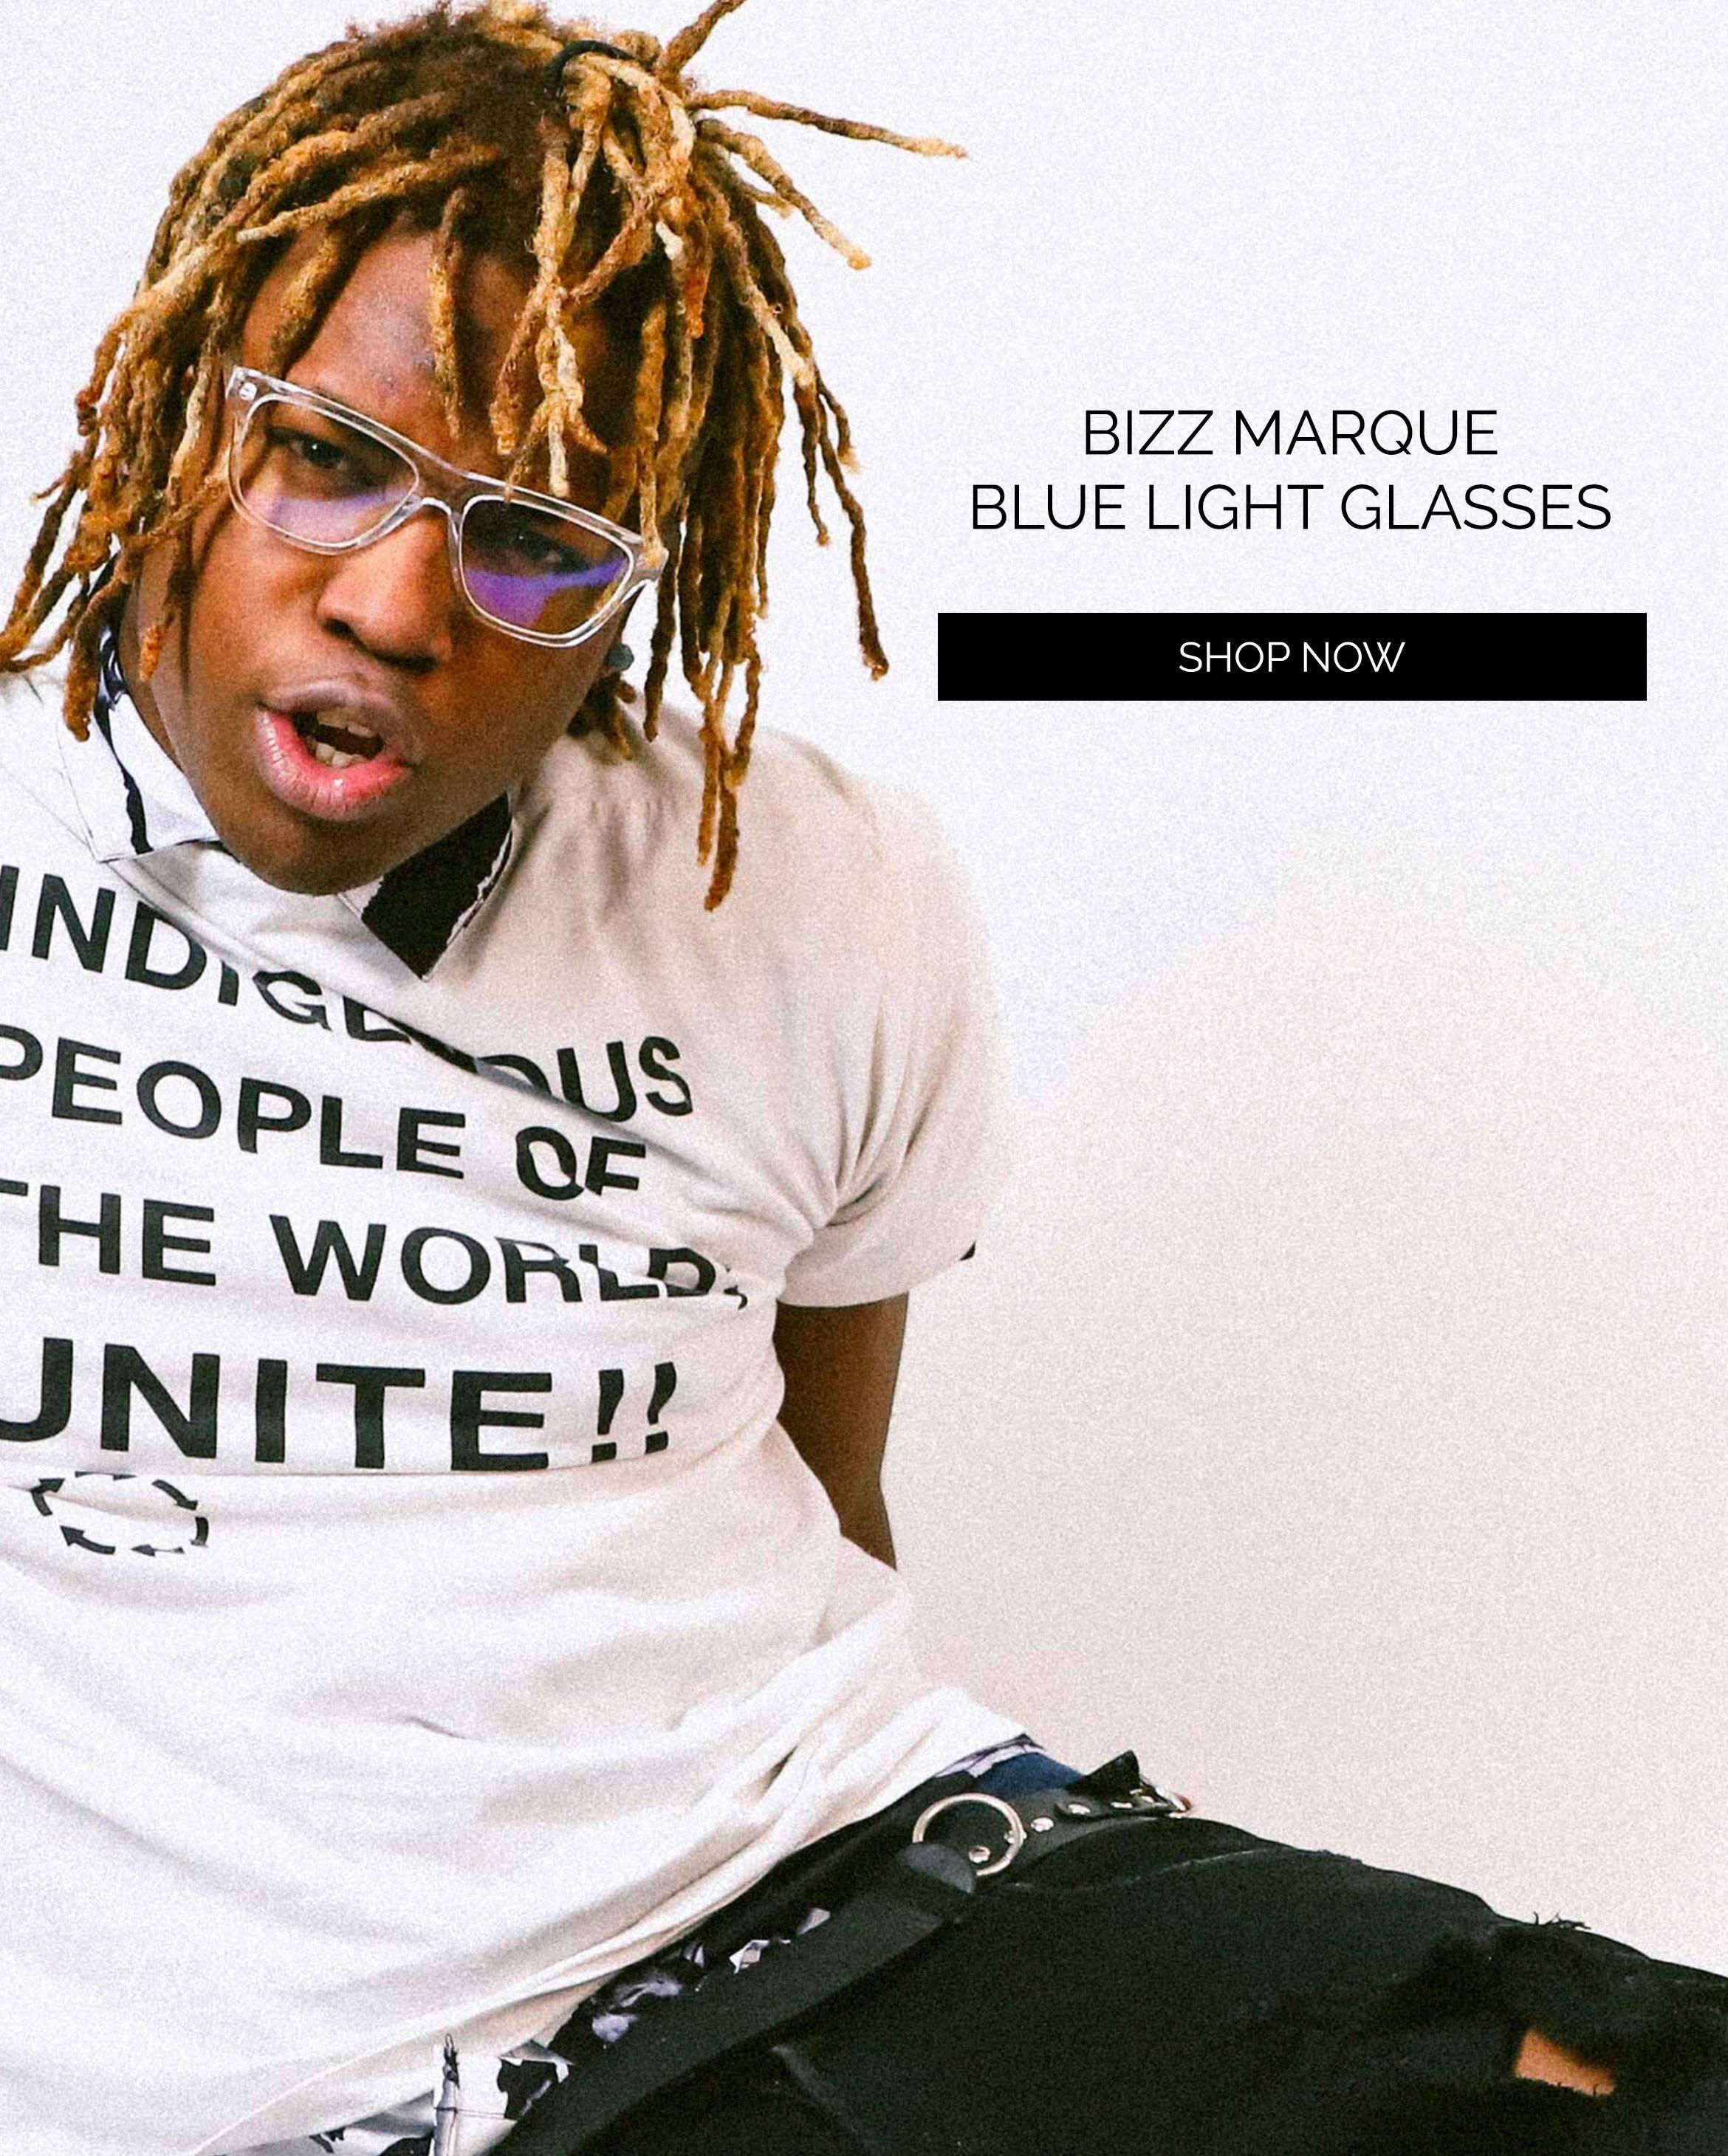 Bizz Marque Blue Light Glasses